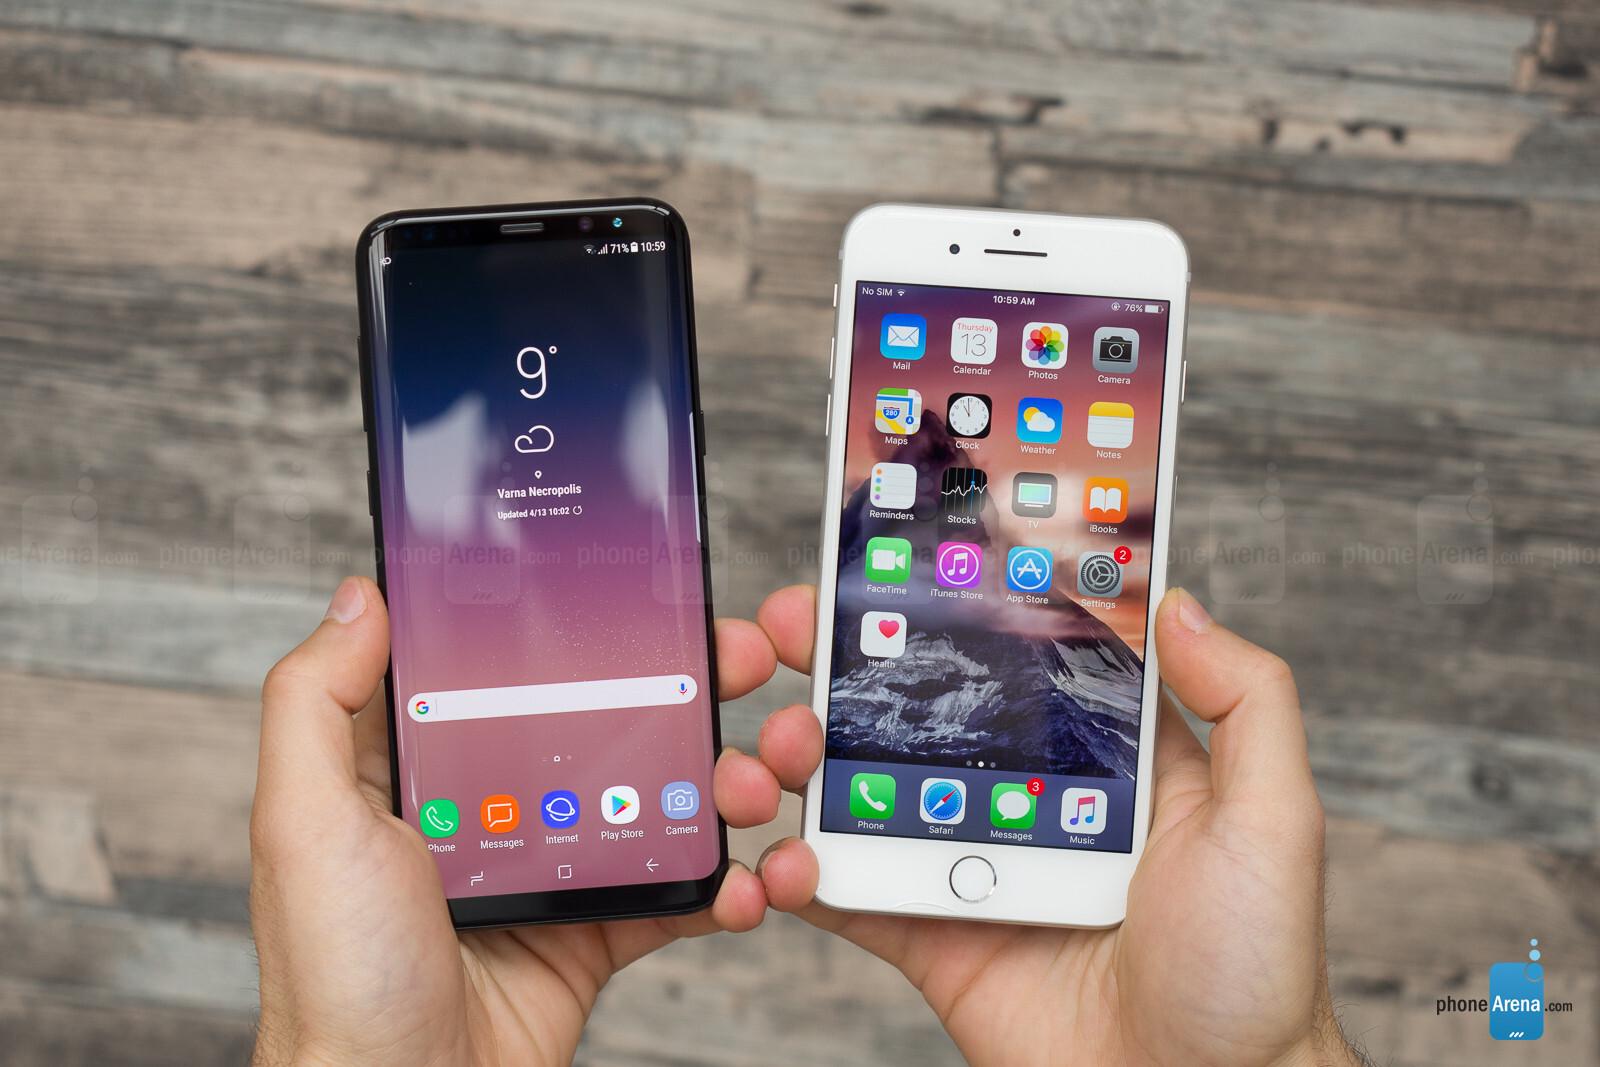 IPHONE 7 VS IPHONE 8 ARENA